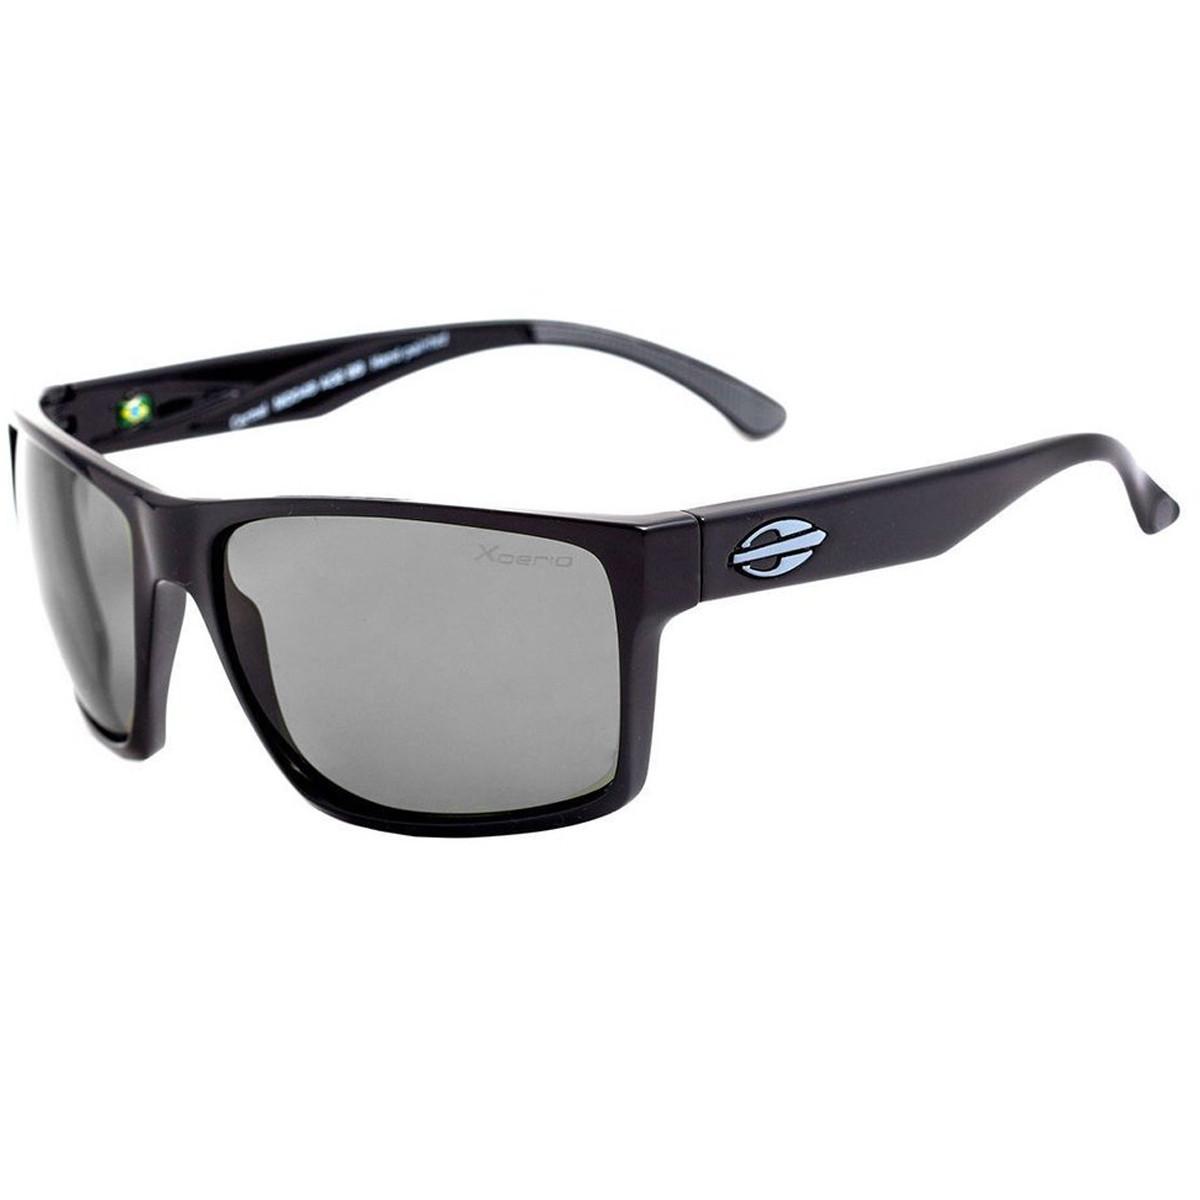 Óculos Mormaii Malibu 2 Preto Brilho Lente Cinza ref M0046A0201 8b925330e1